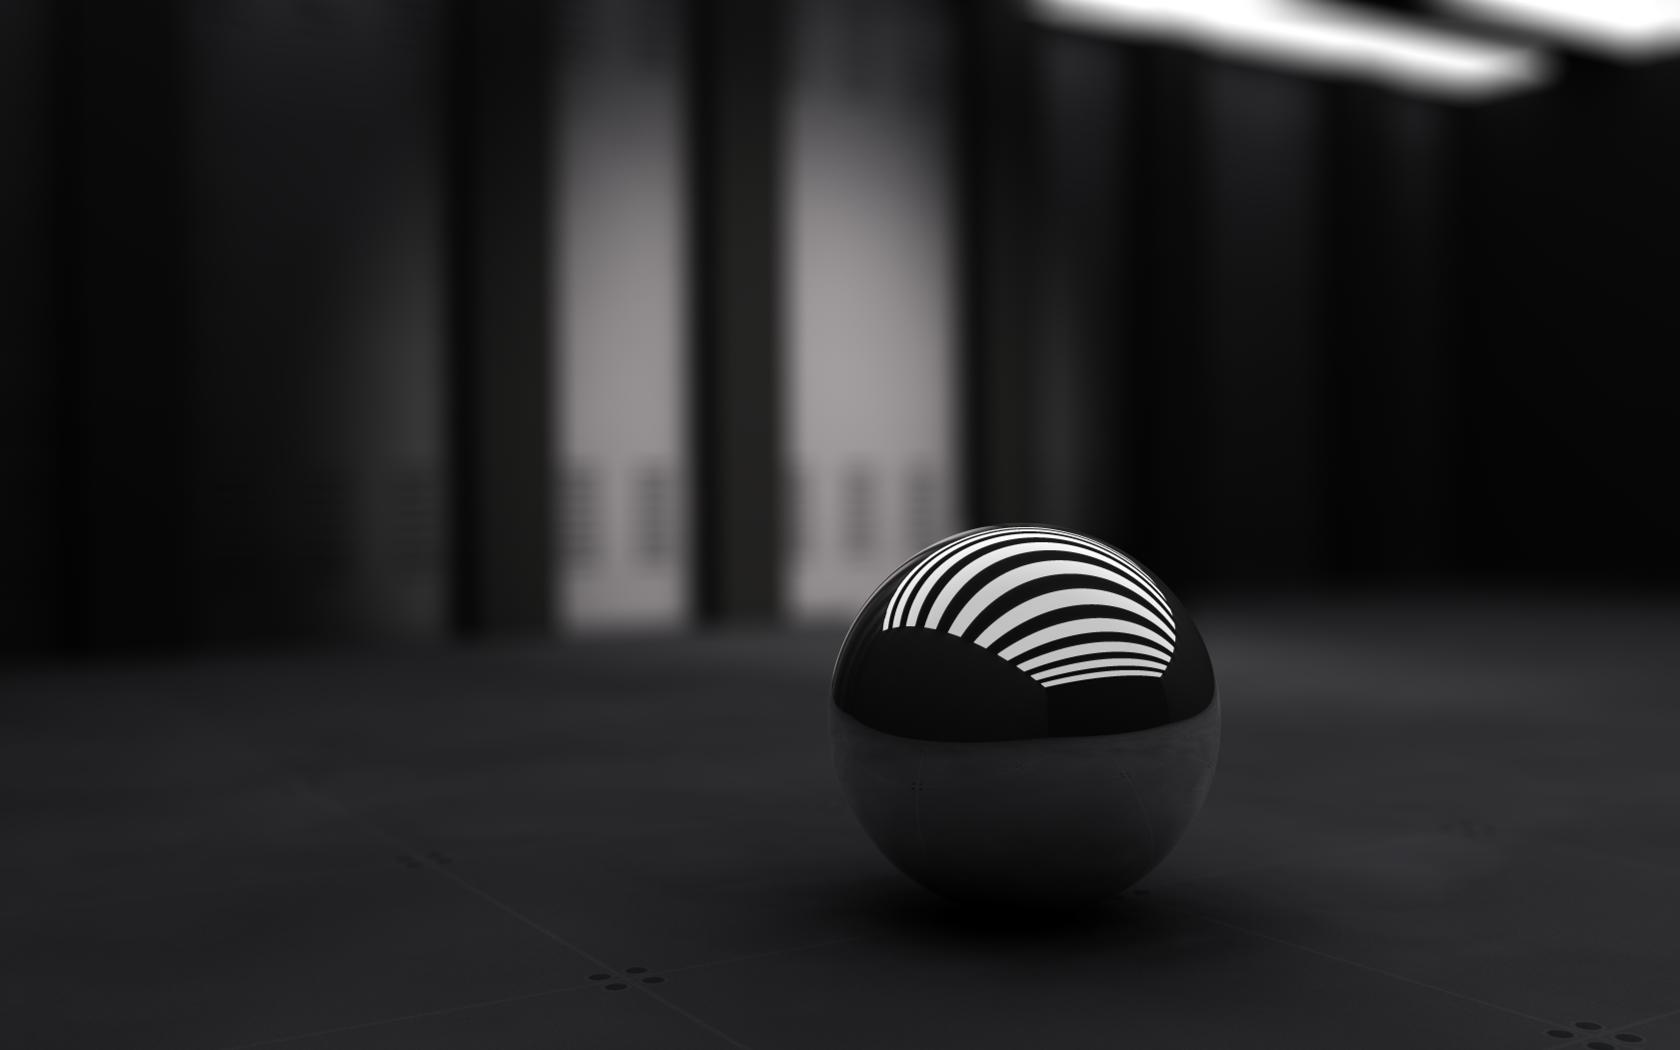 3D Black Ball Wallpapers HD Wallpapers 1680x1050